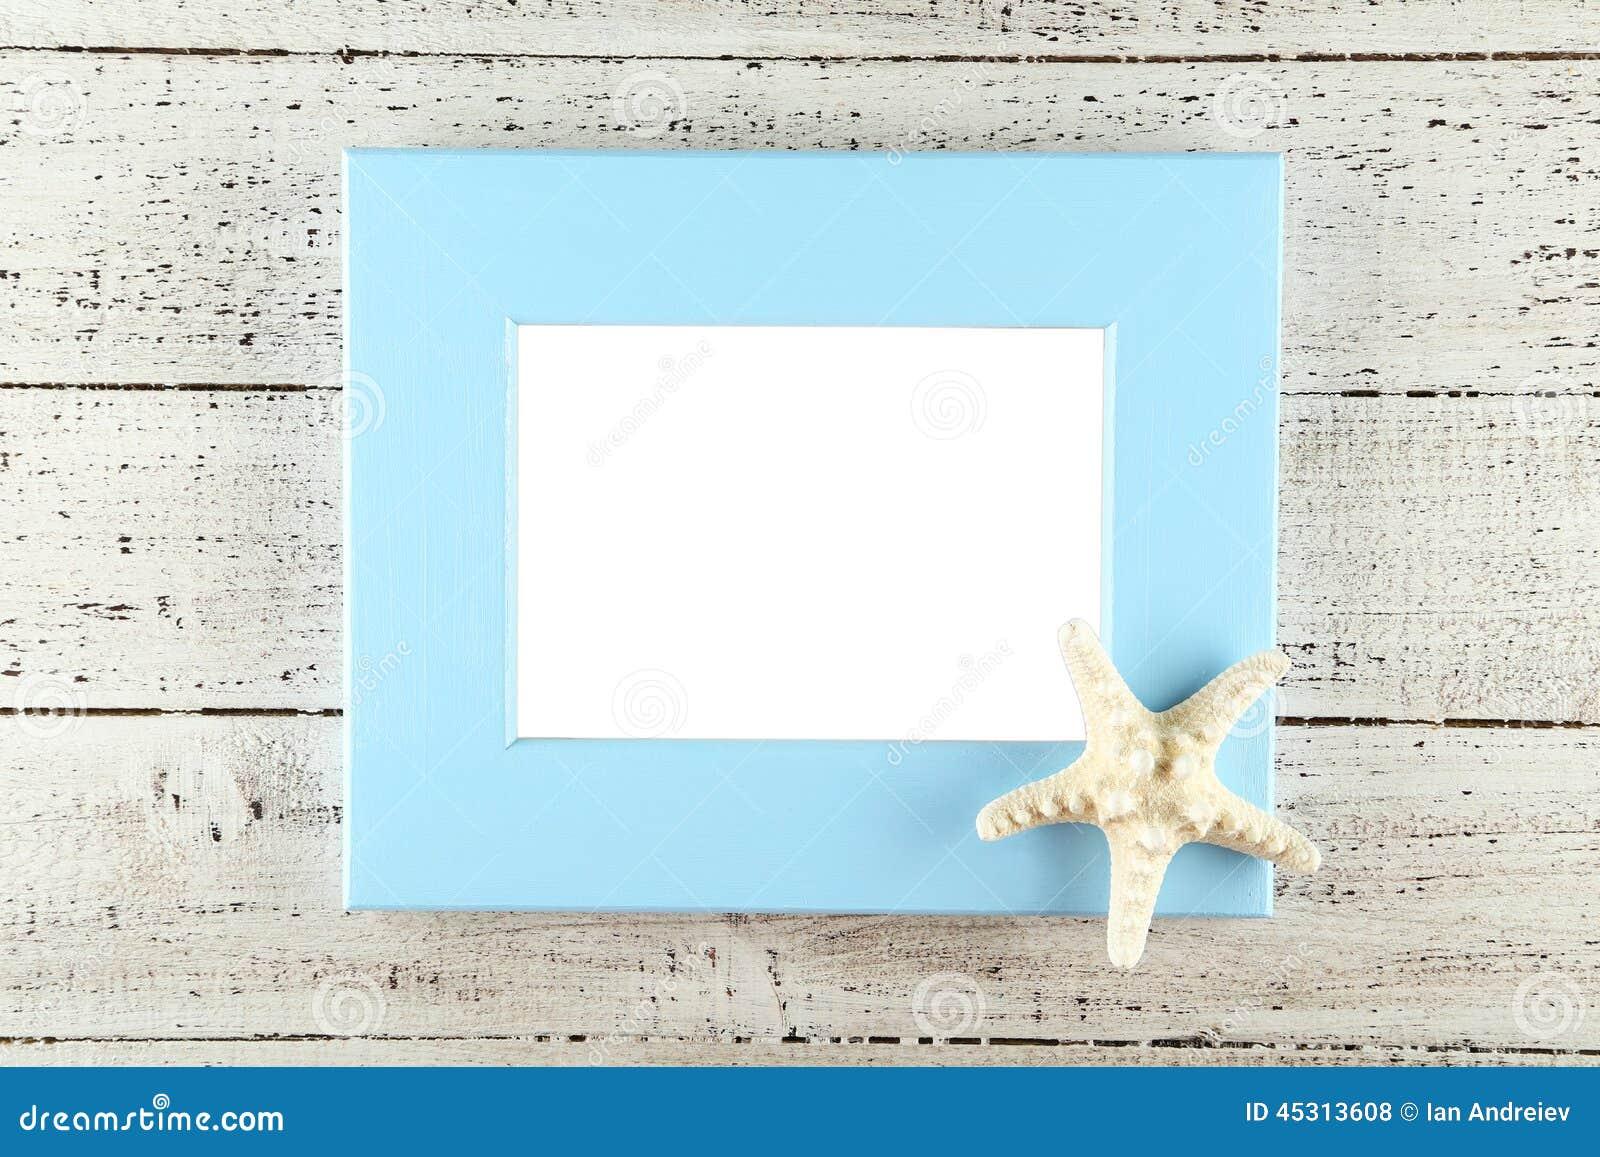 Wood frame on white wooden background.